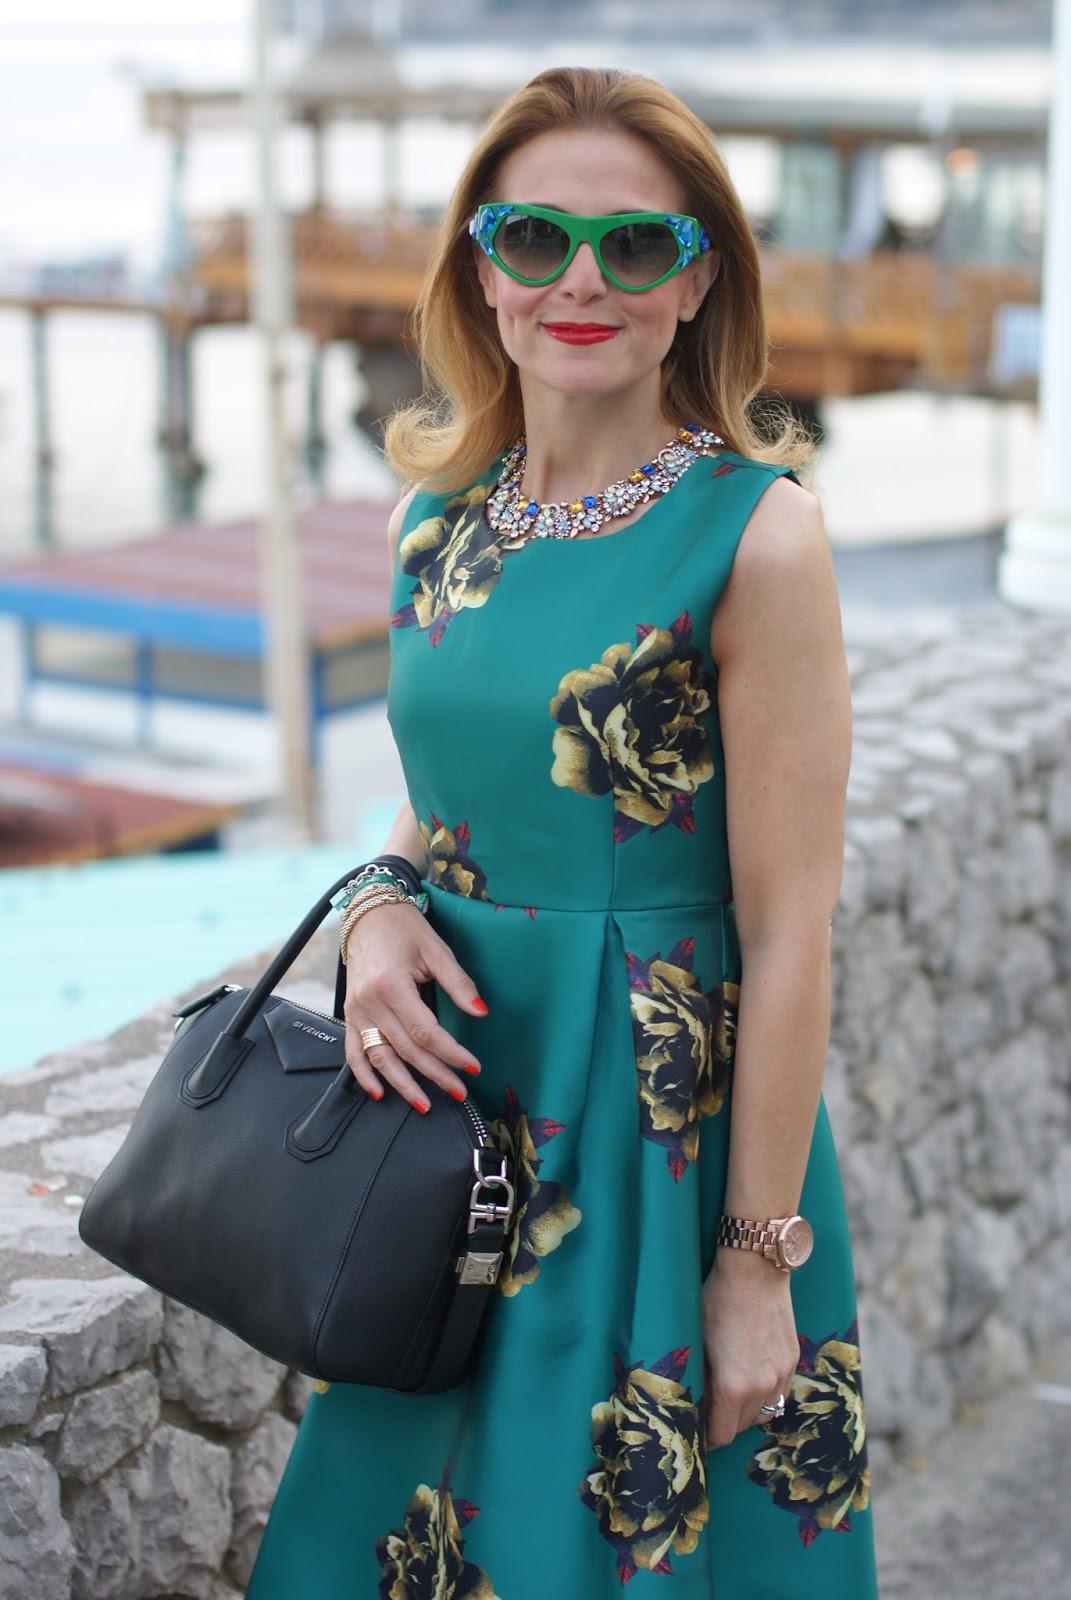 Choies green midi dress and Prada Voice sunglasses found on Giarre on Fashion and Cookies fashion blog, fashion blogger style